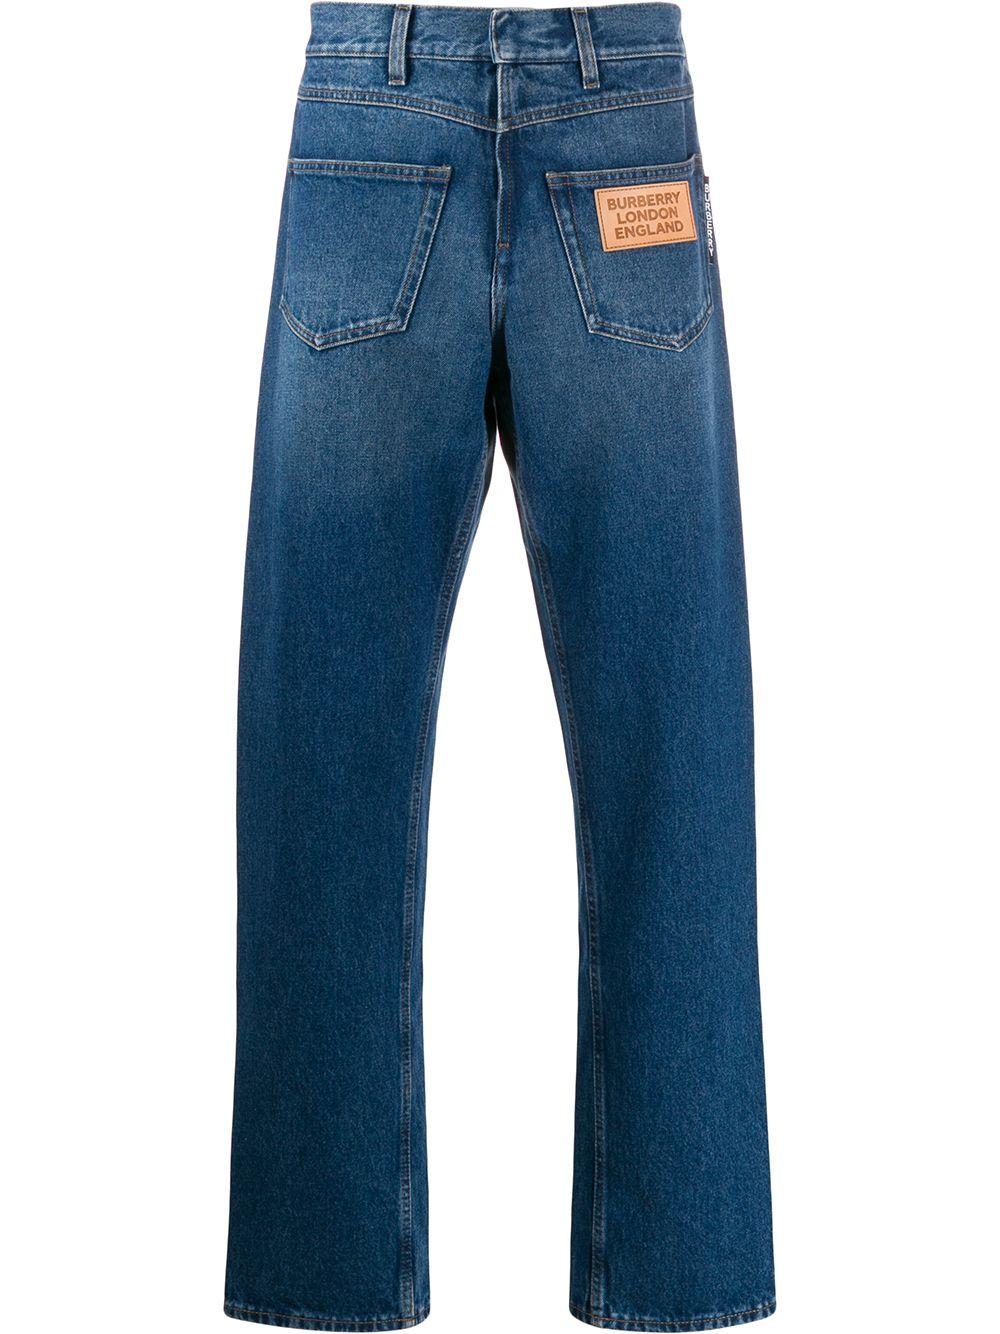 Workwear Denim Jeans